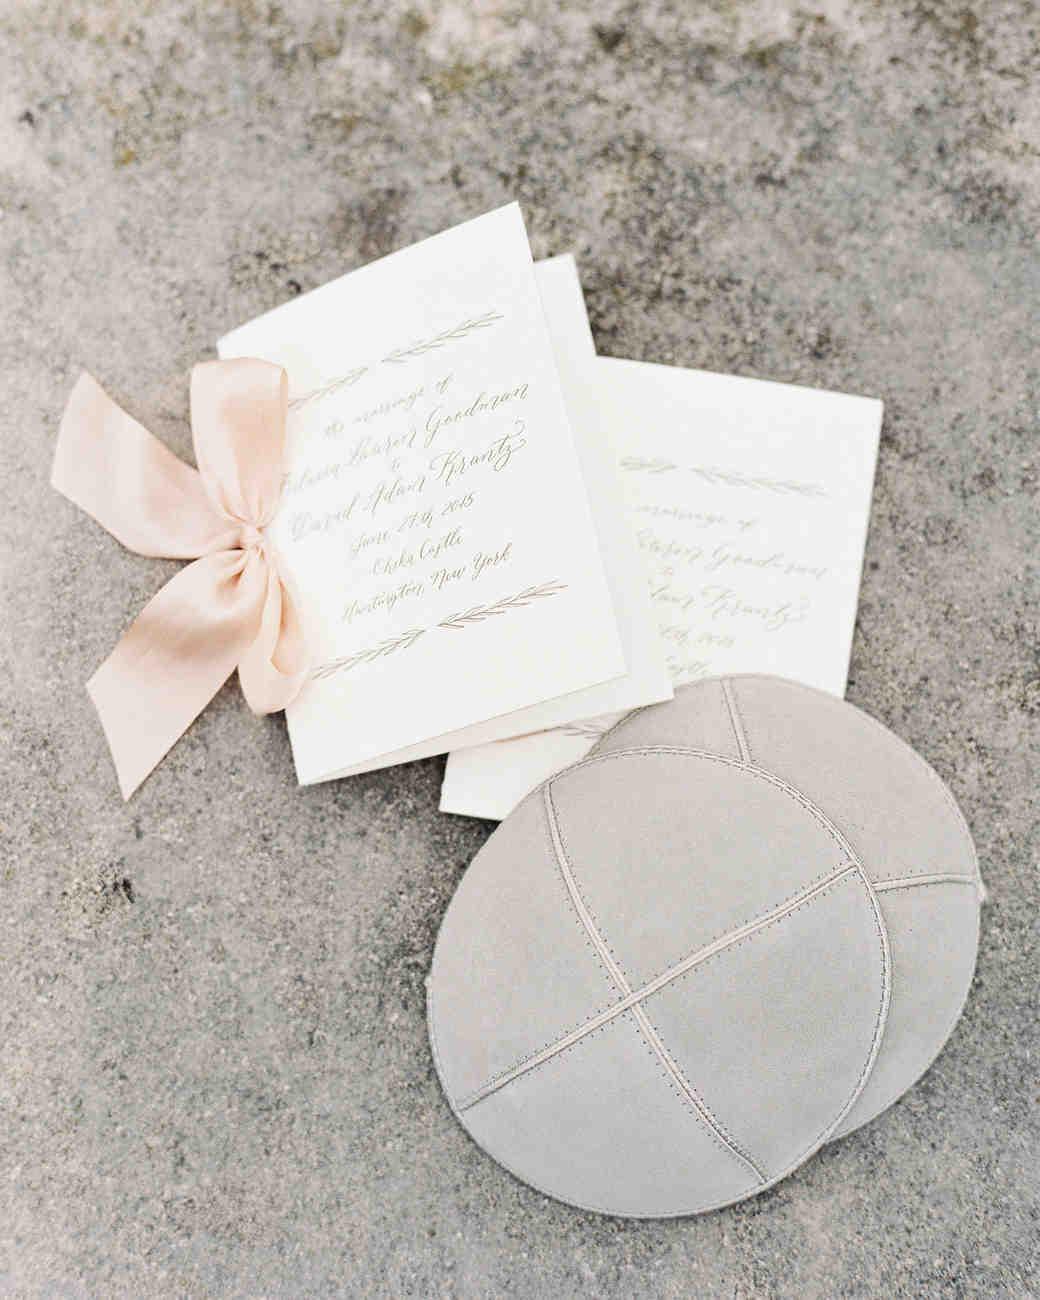 rebecca-david-wedding-new-york-program-yarmulkes-6-d112241.jpg